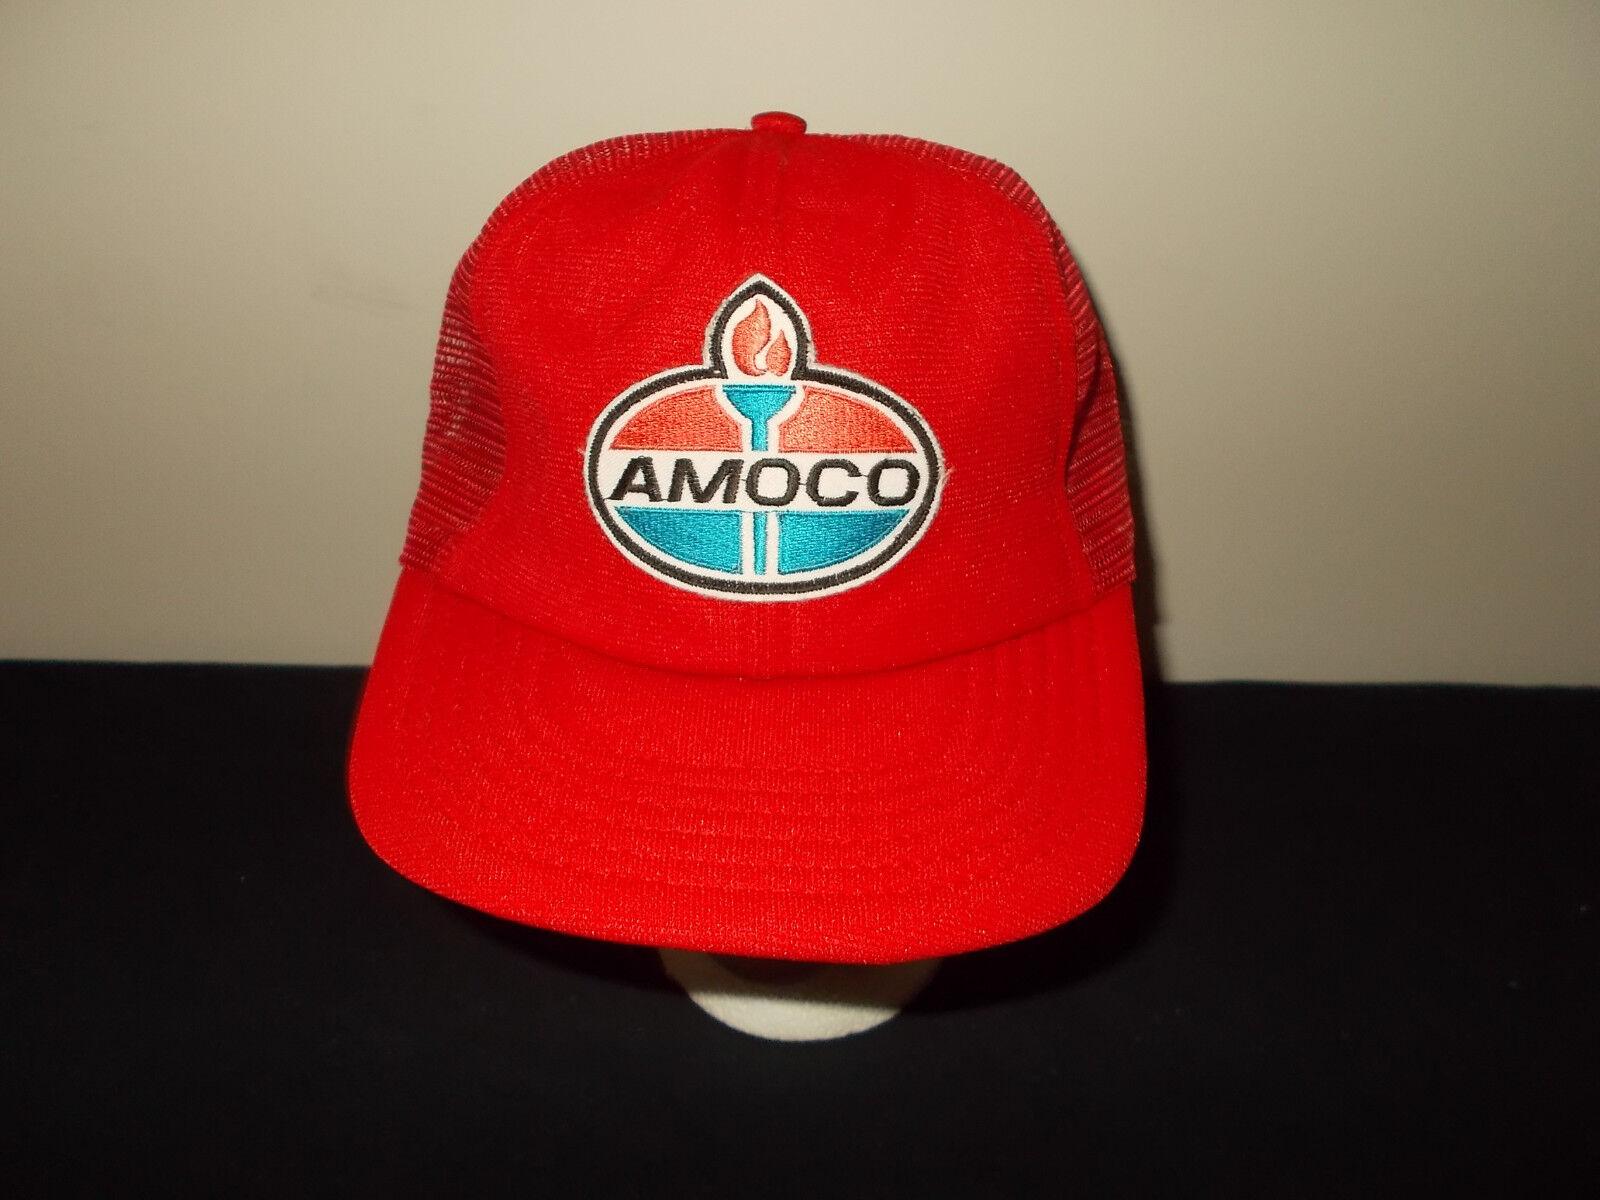 Vtg-1980s Amoco Gas Öl Station Werbung Patch Service Netz Hut Sku12       Gute Qualität